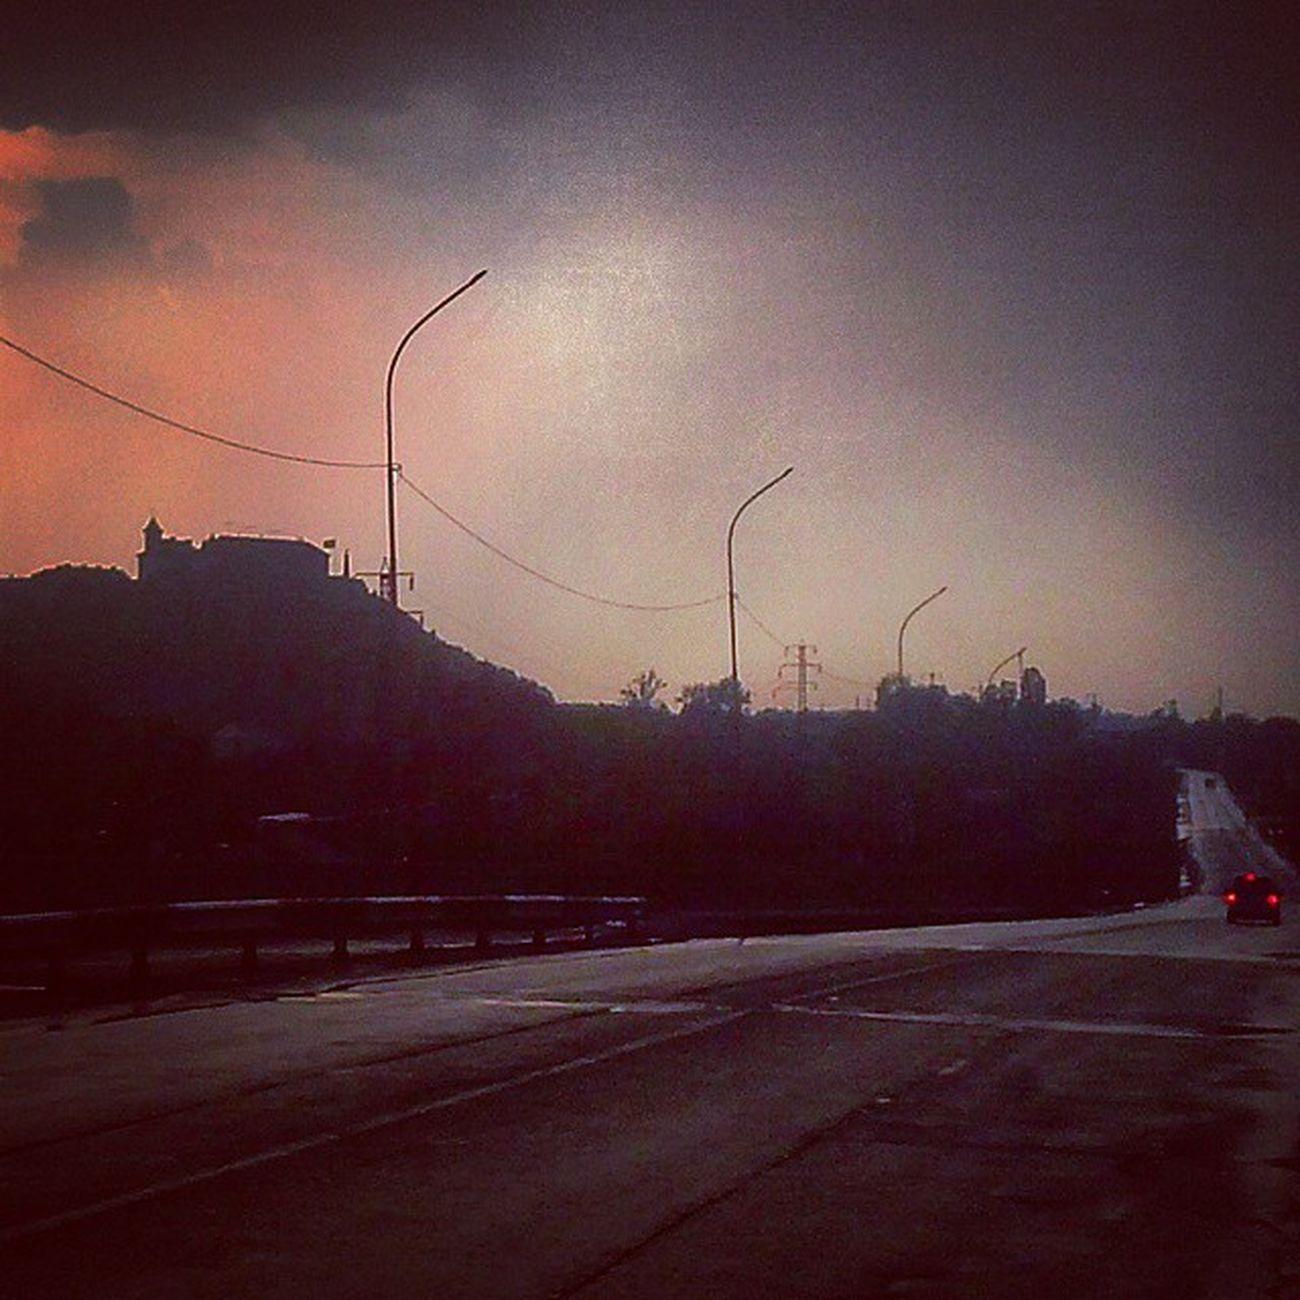 Вїзд в Мукачево, через кілька хвилин почалася гроза Паланок